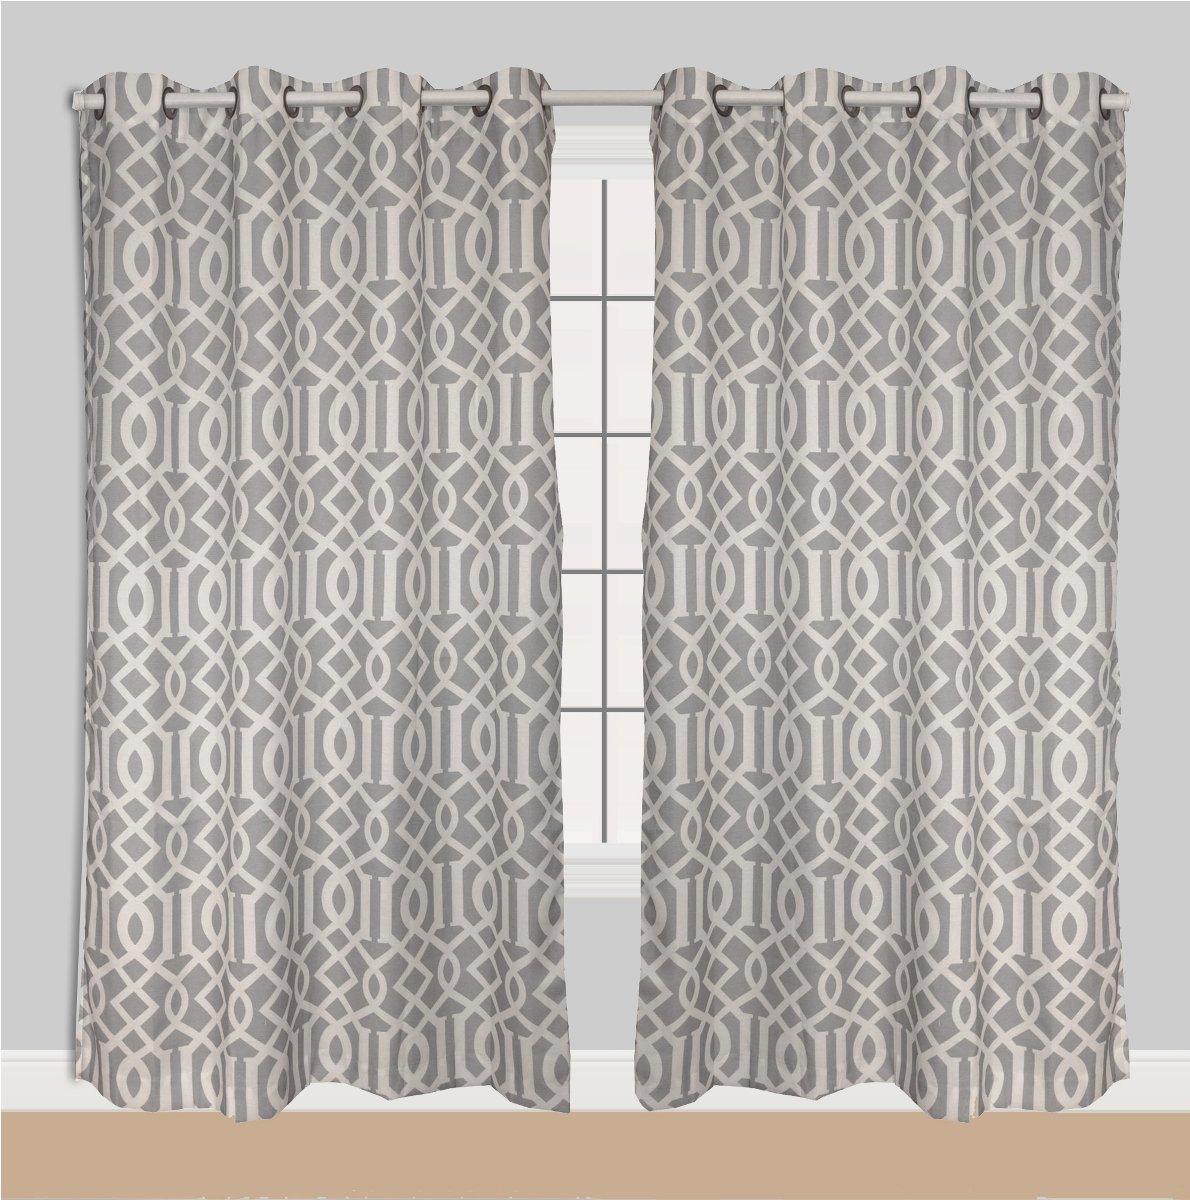 Trellis Drapes Part - 18: Amazon.com: Luxurious Moroccan Trellis Grommet Curtain Panels 84-inch X 54  Inch Set Of 2 Silver Grey: Home U0026 Kitchen